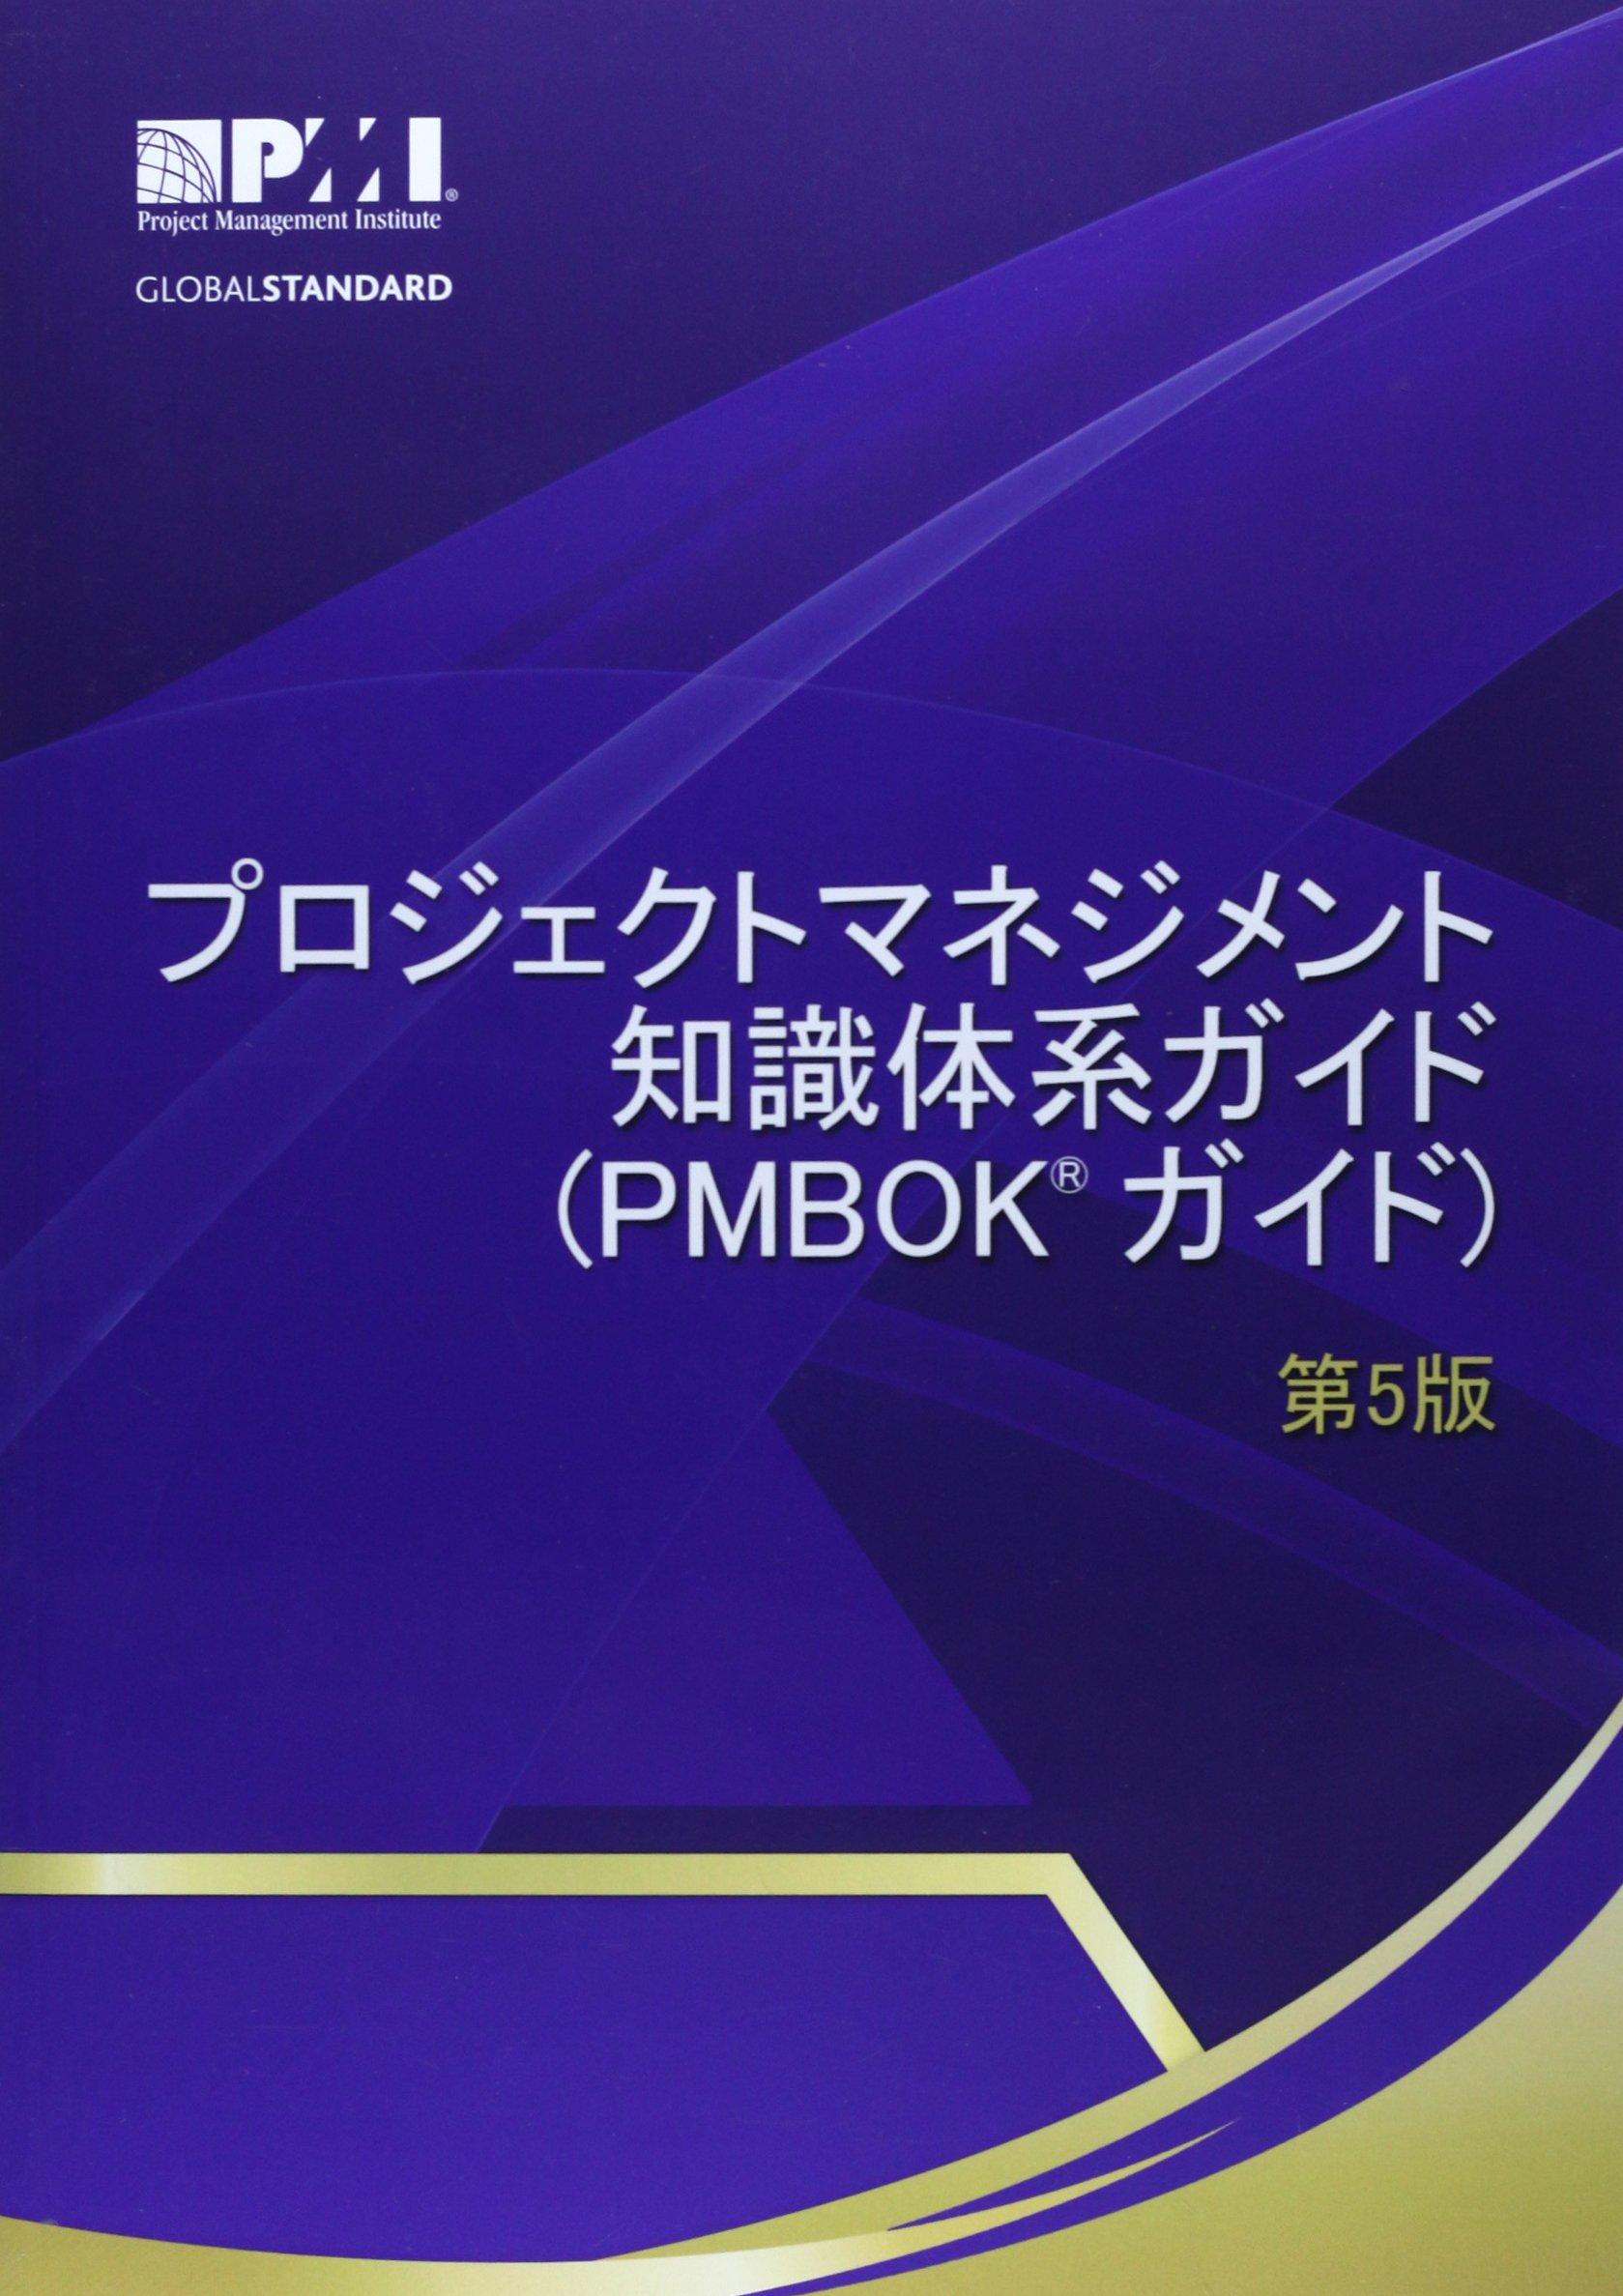 Purojekuto Manejimento Chishiki Taikei Gaido (PMBOK® Gaido) Dai Go Ban [A Guide to the Project Management Body of Knowledge (PMBOK® Guide)-Fifth Edition](Japanese Edition)